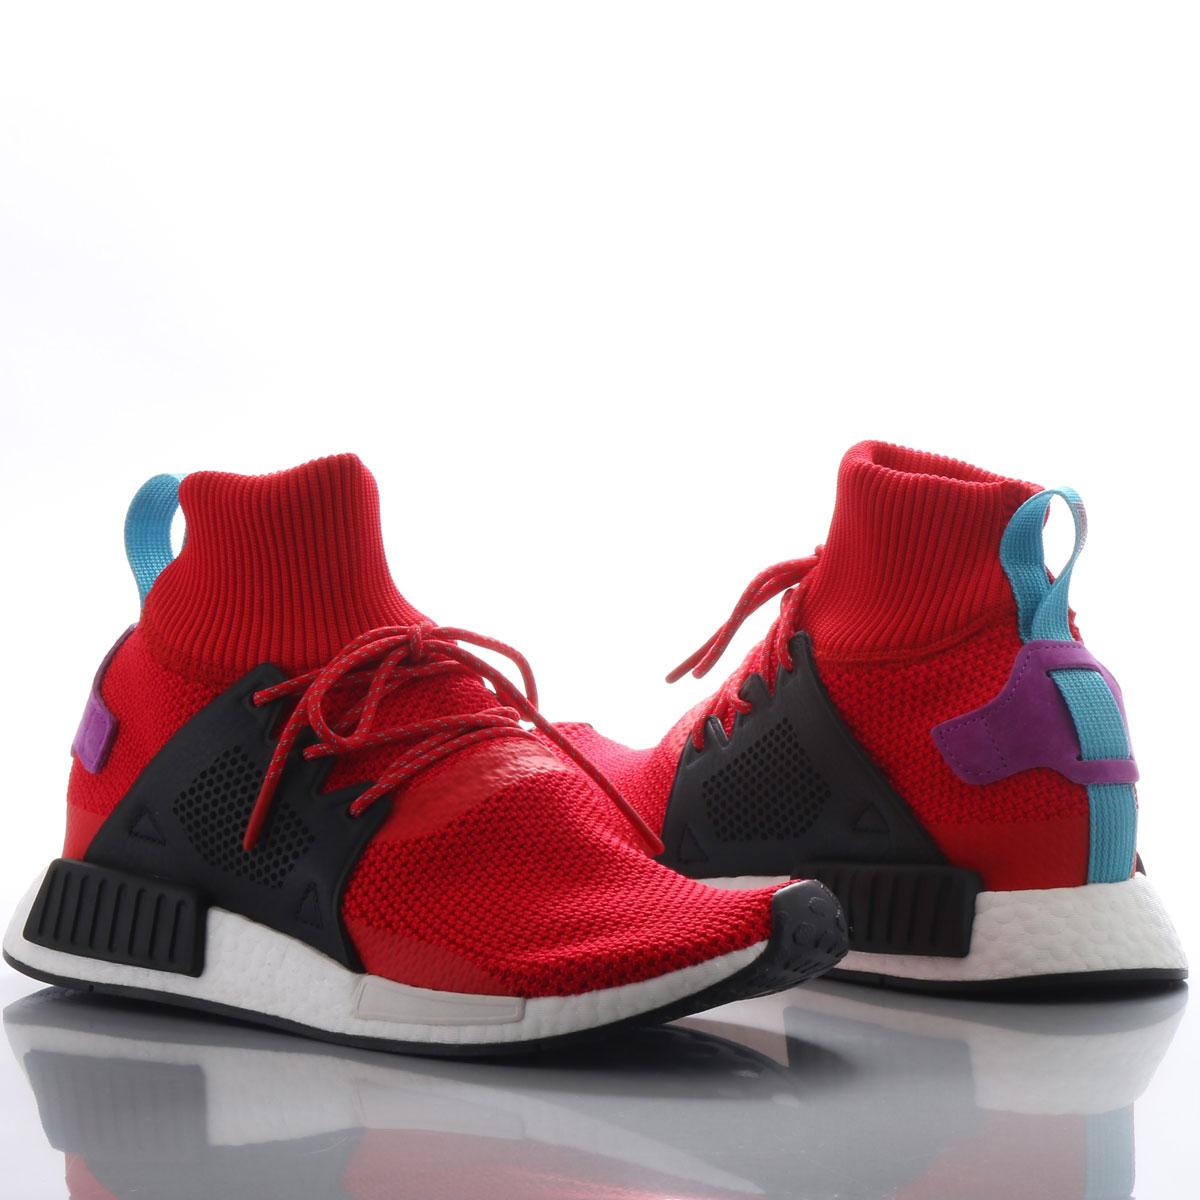 adidas Originals NMD_XR1 ADVENTURE PK (アディダス オリジナルス NMD_XR1 アドベンチャー PK) Scarlet/Core Black/Shock Purple【メンズ スニーカー】17FW-S